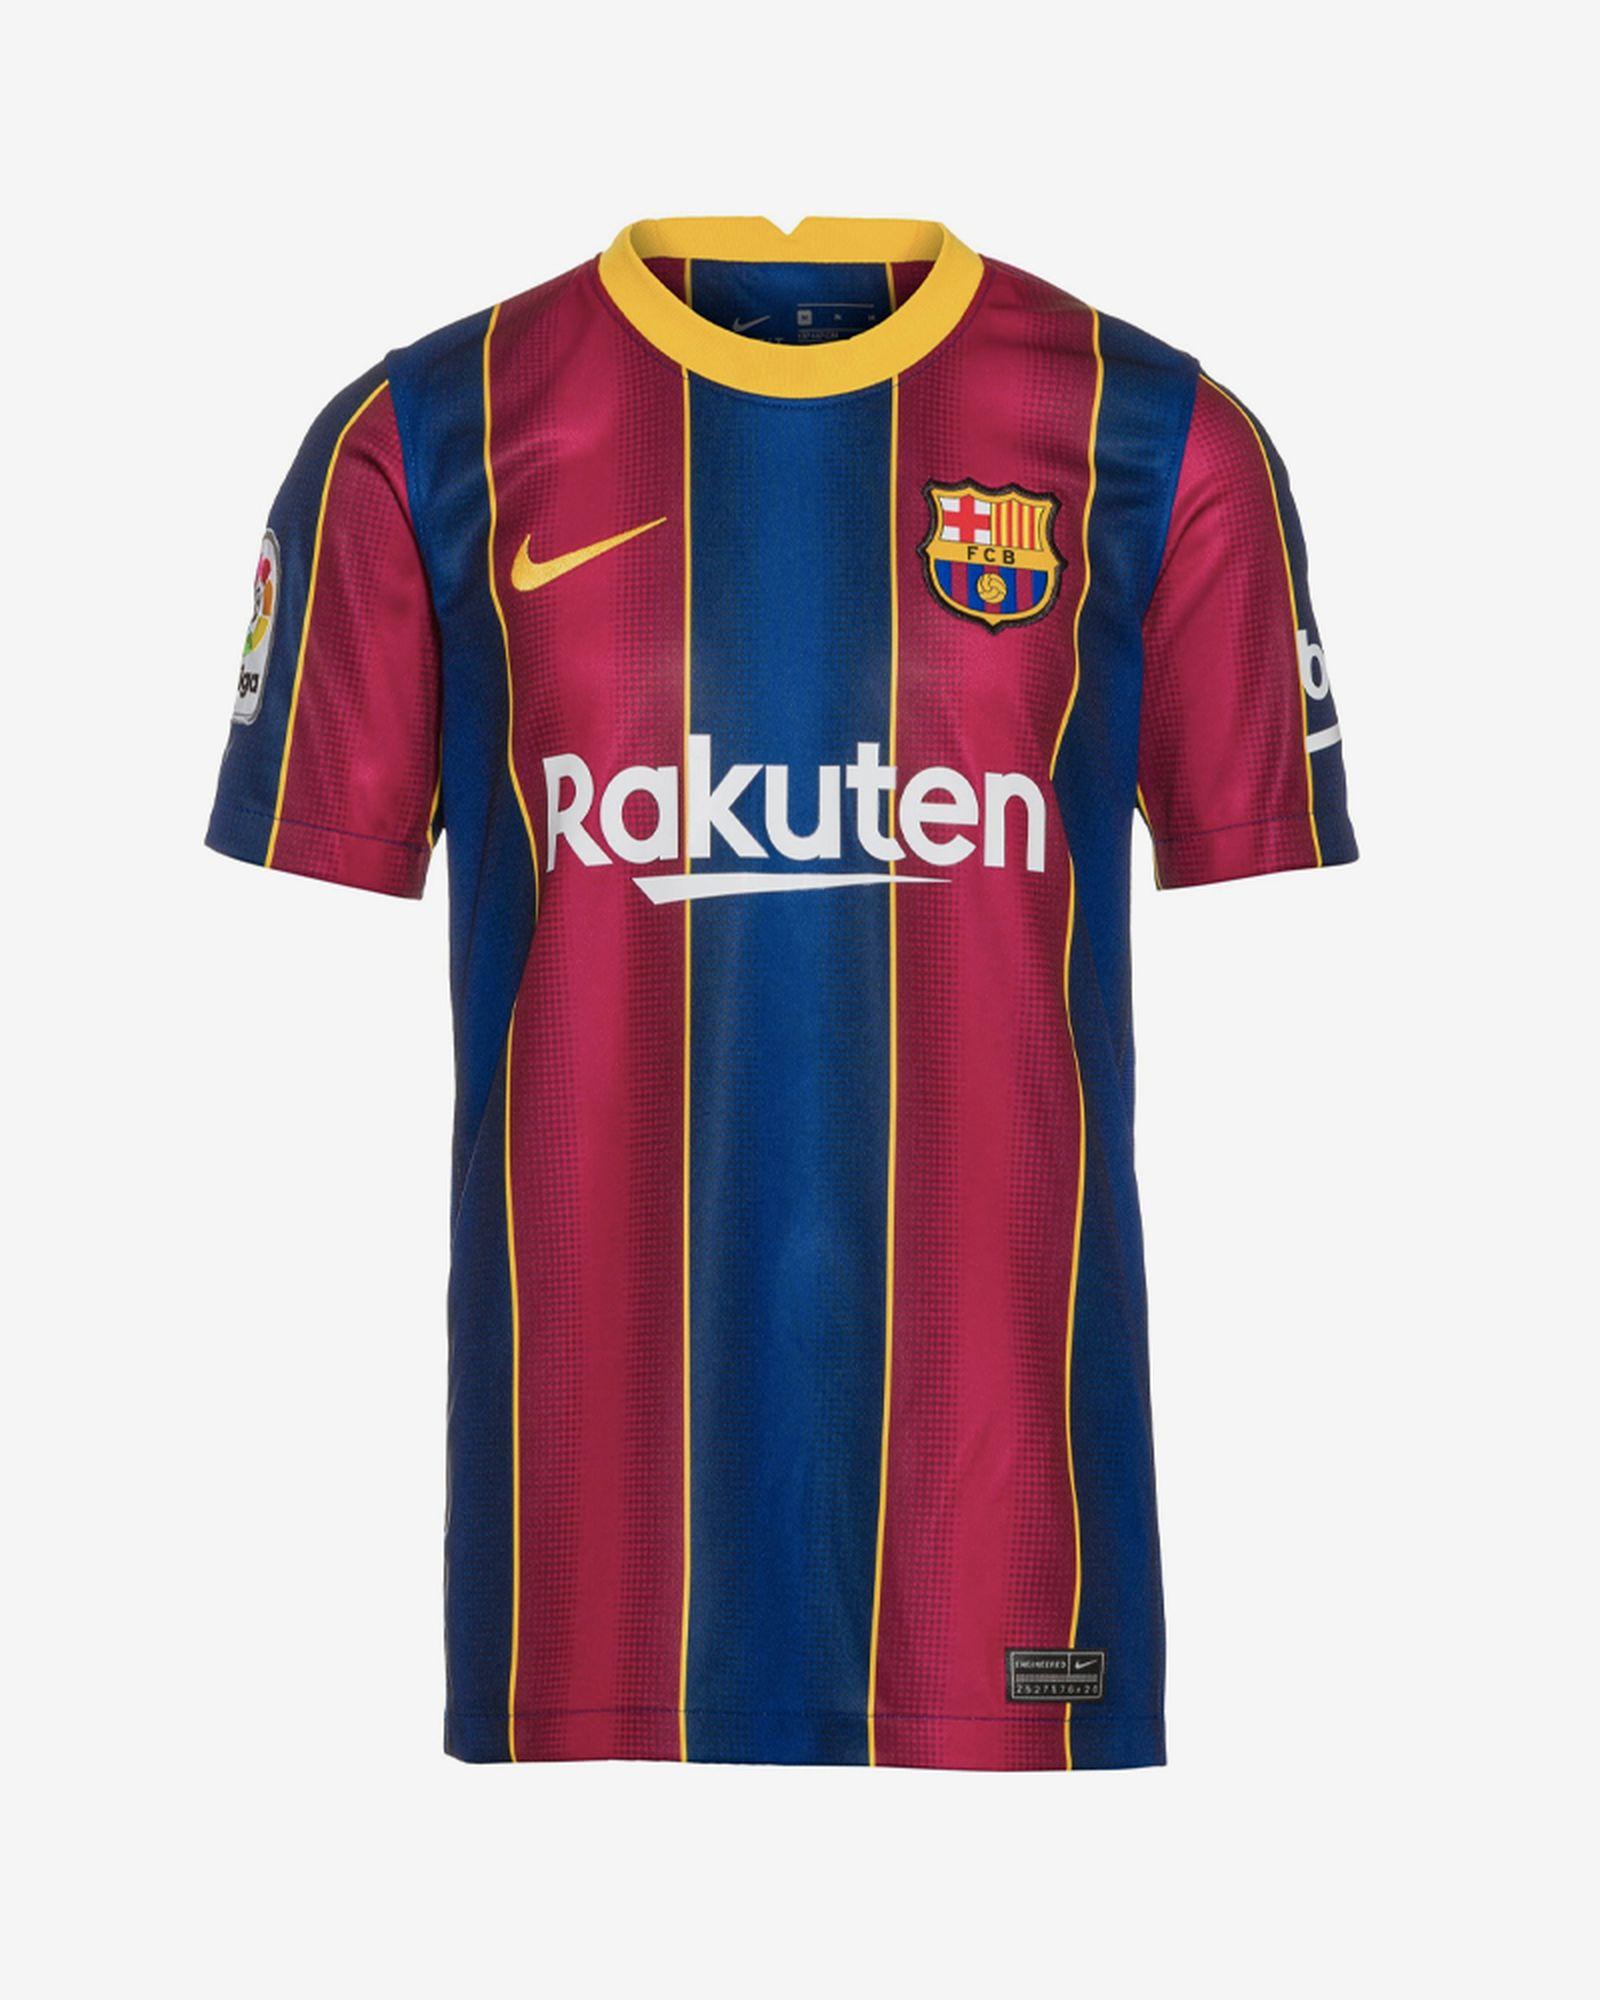 football-shirts-2020-review-10